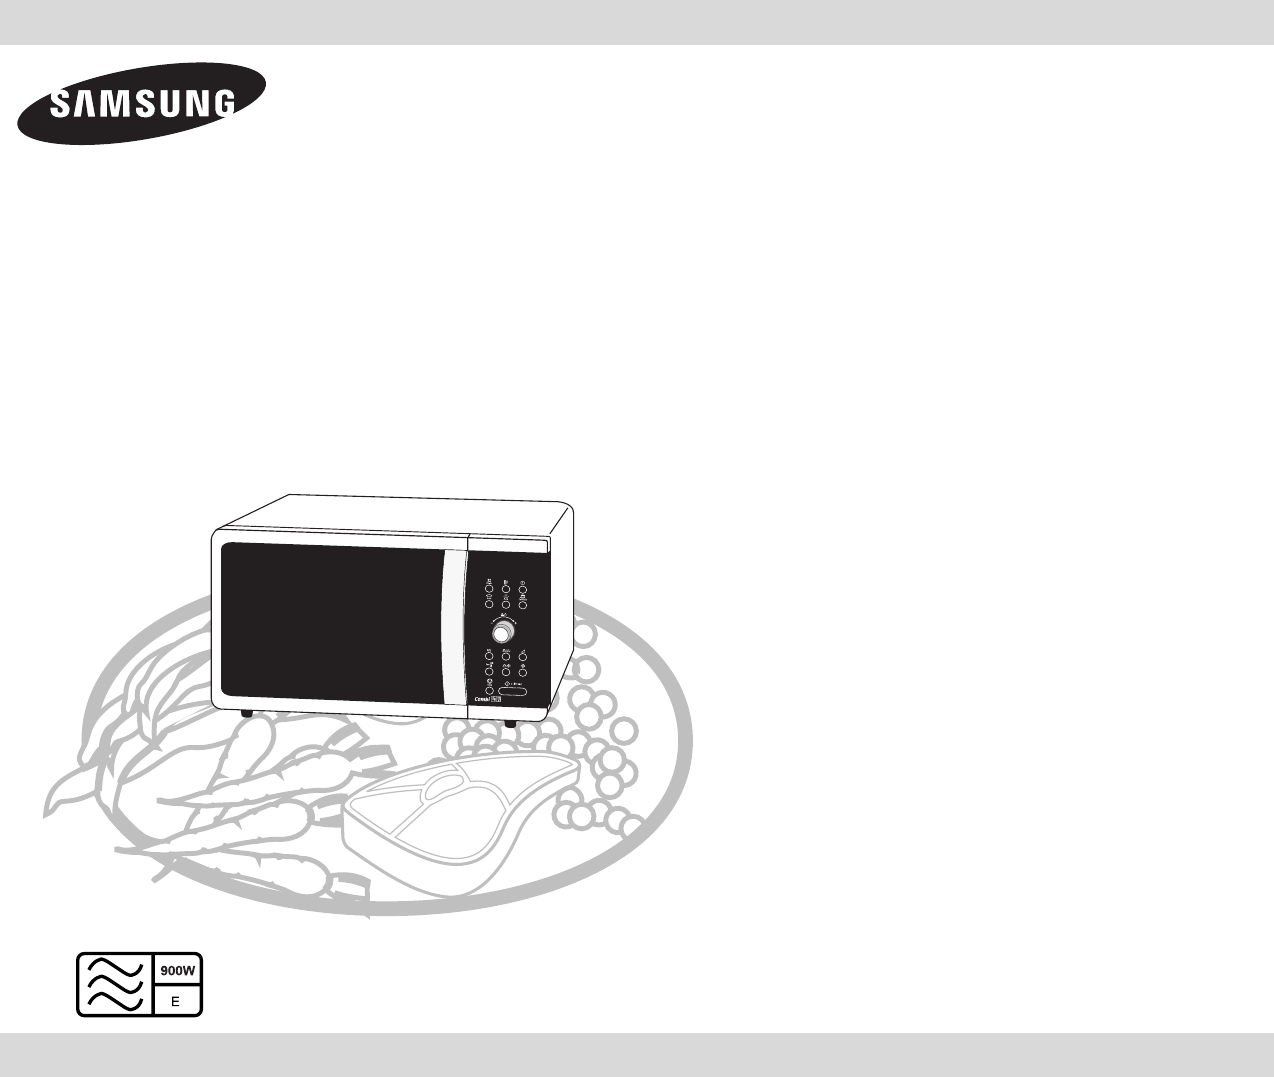 Super Handleiding Samsung CE 1000 (pagina 1 van 32) (English) JQ-87